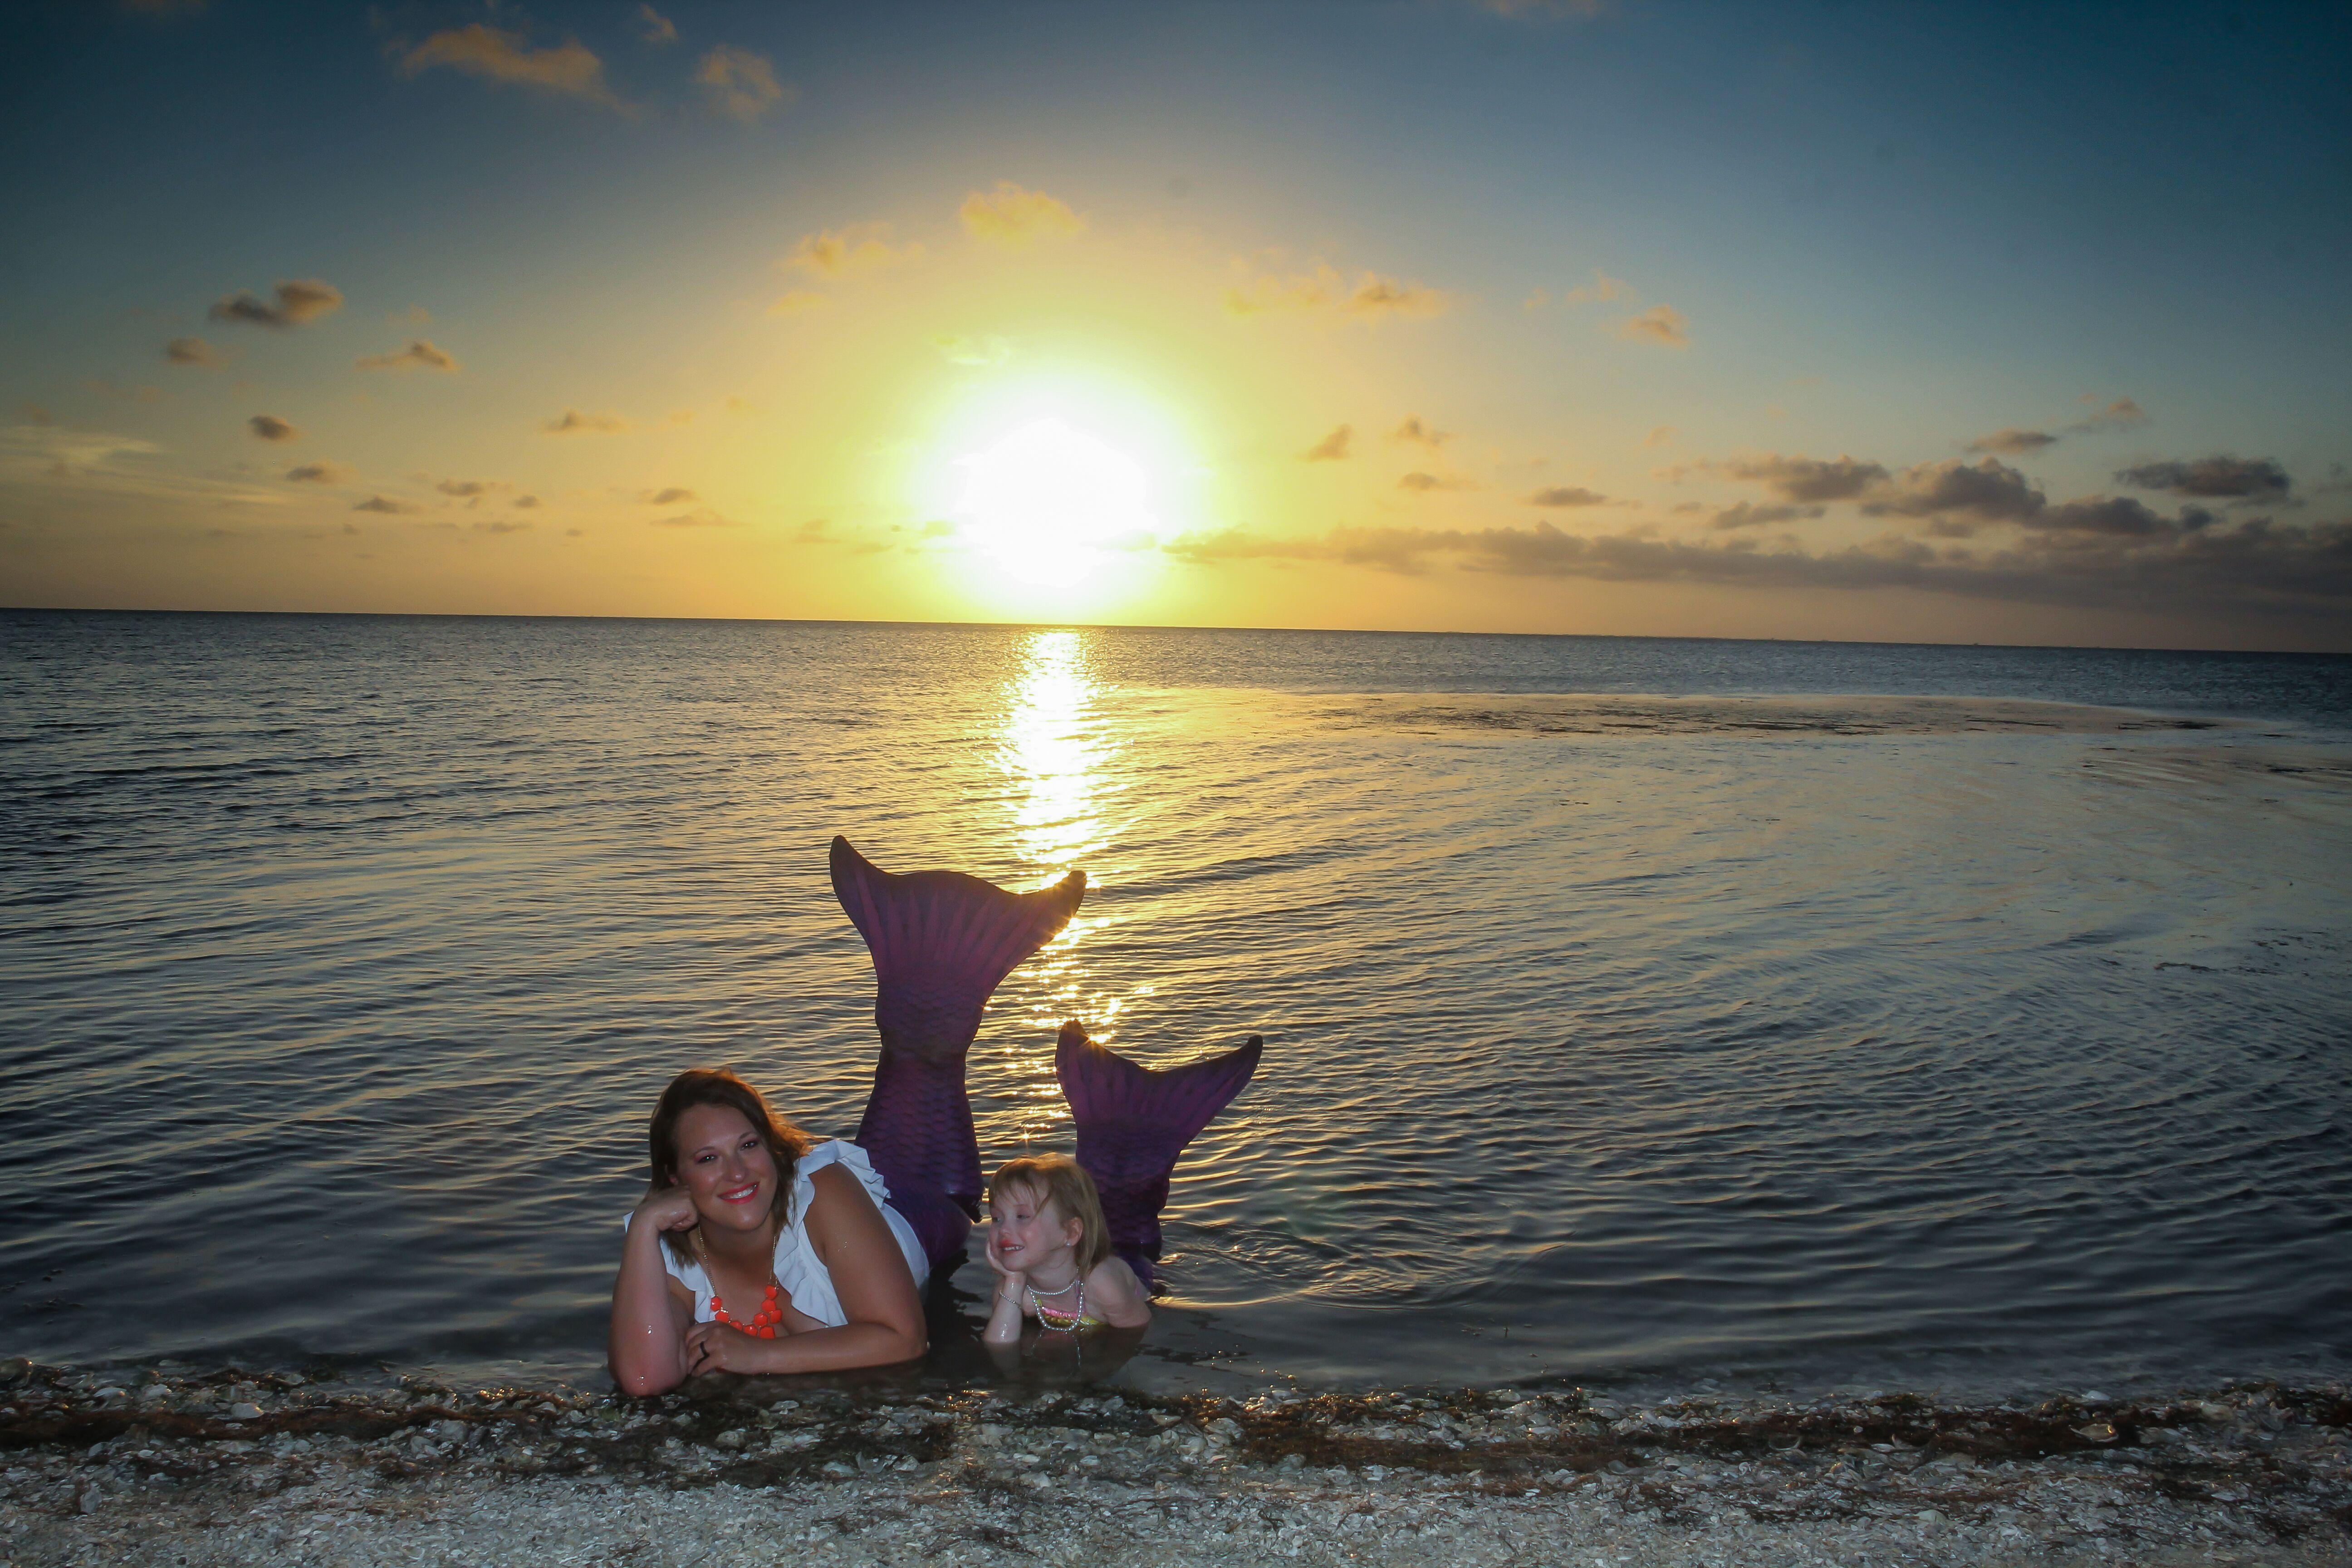 mermaids at sunset